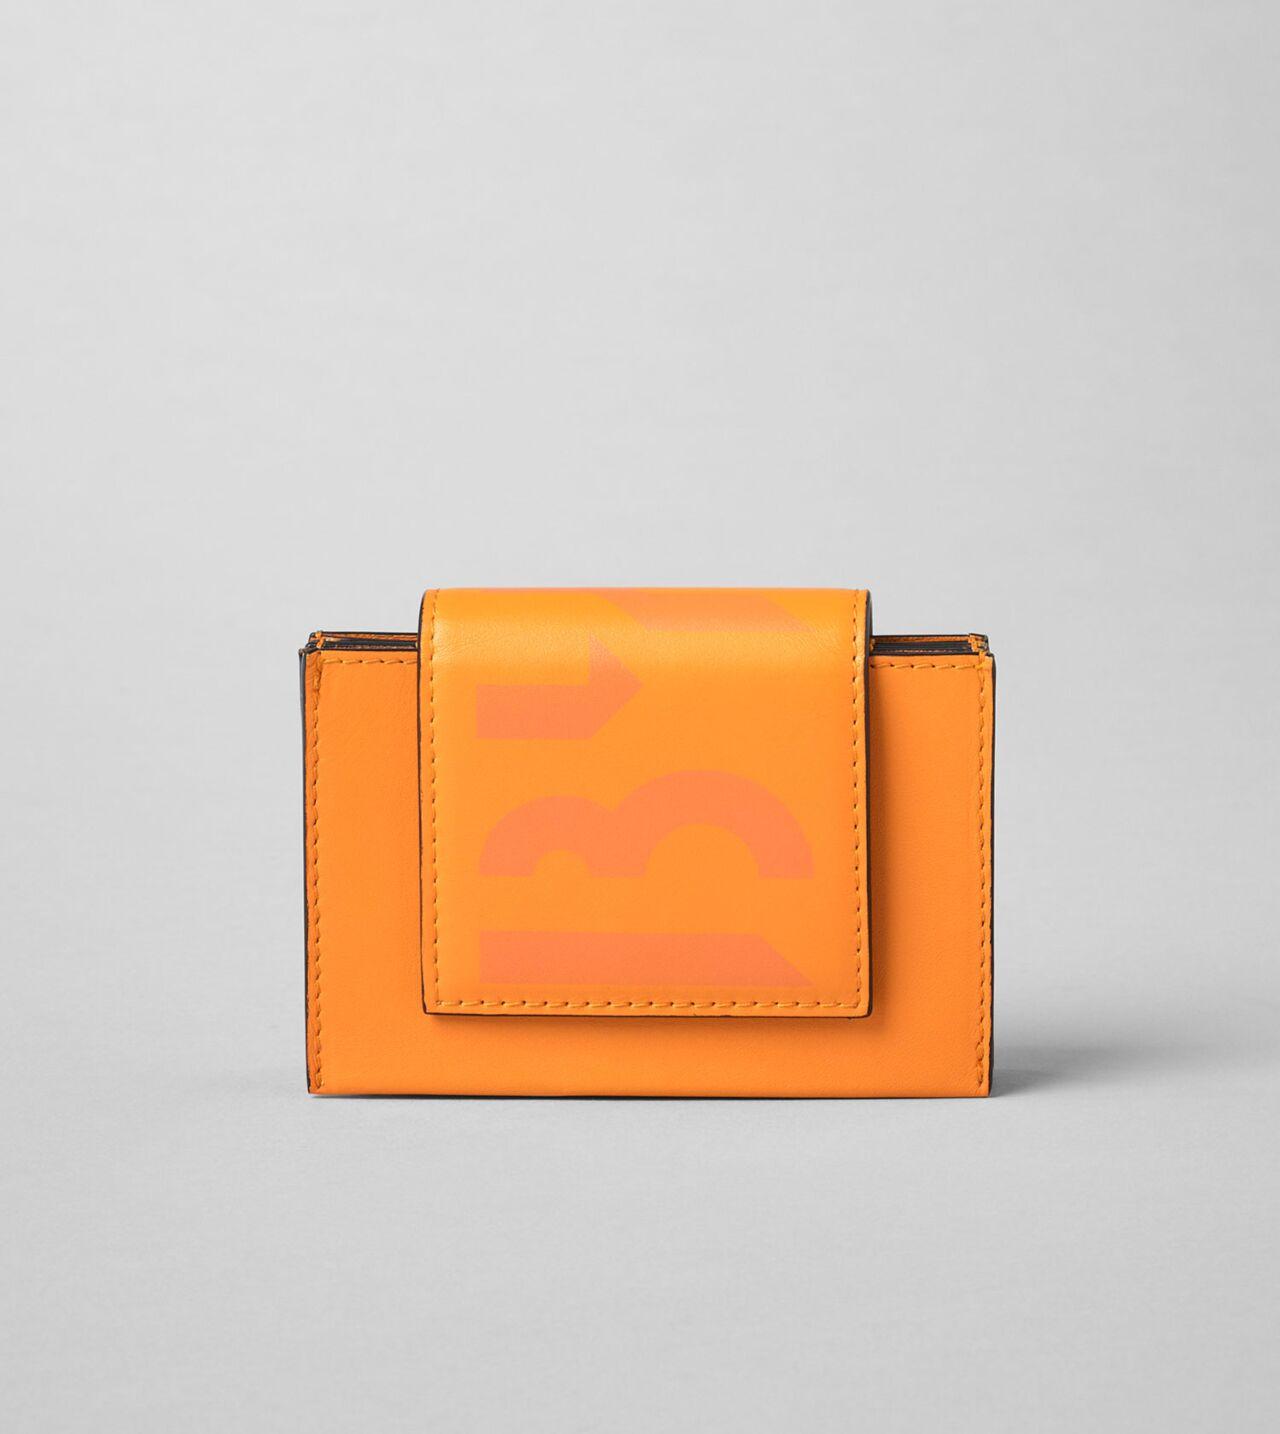 Picture of Byredo Umbrella wallet in Orange